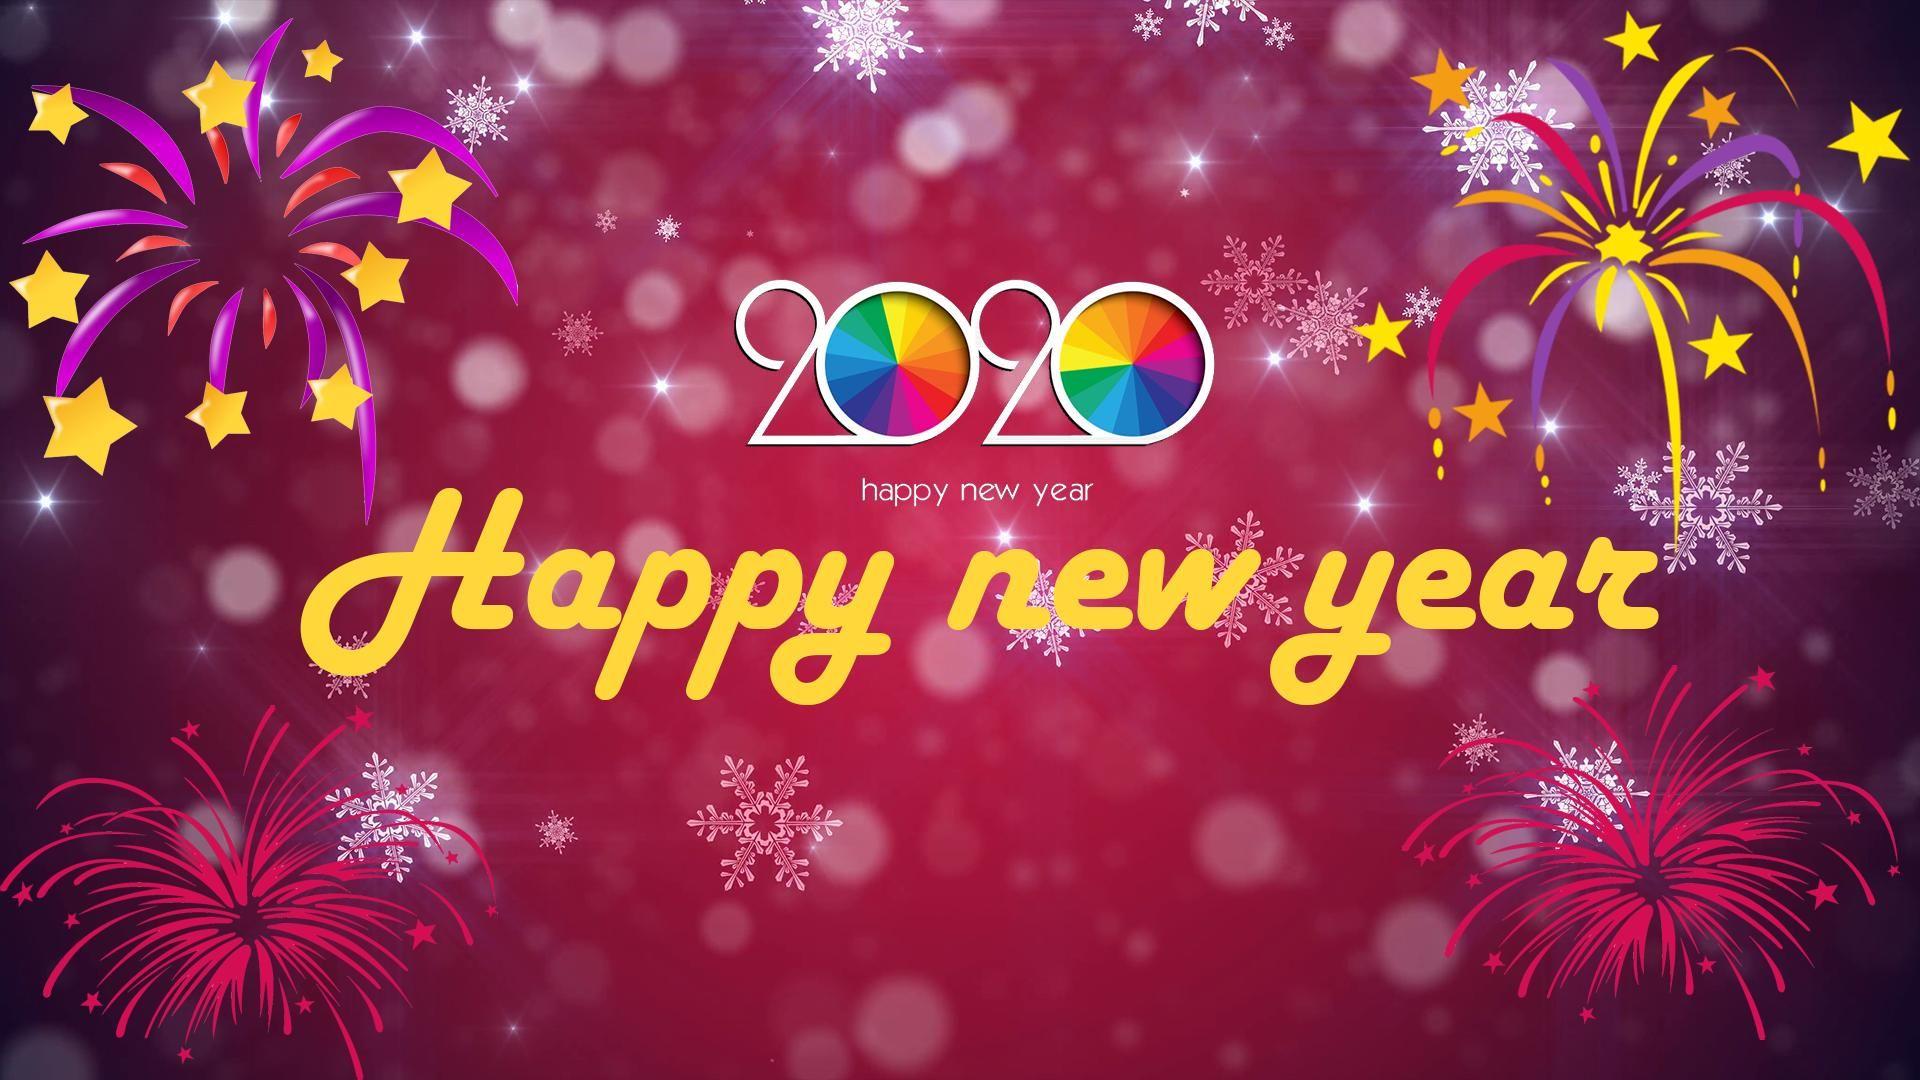 2020 New Year Free Wallpaper